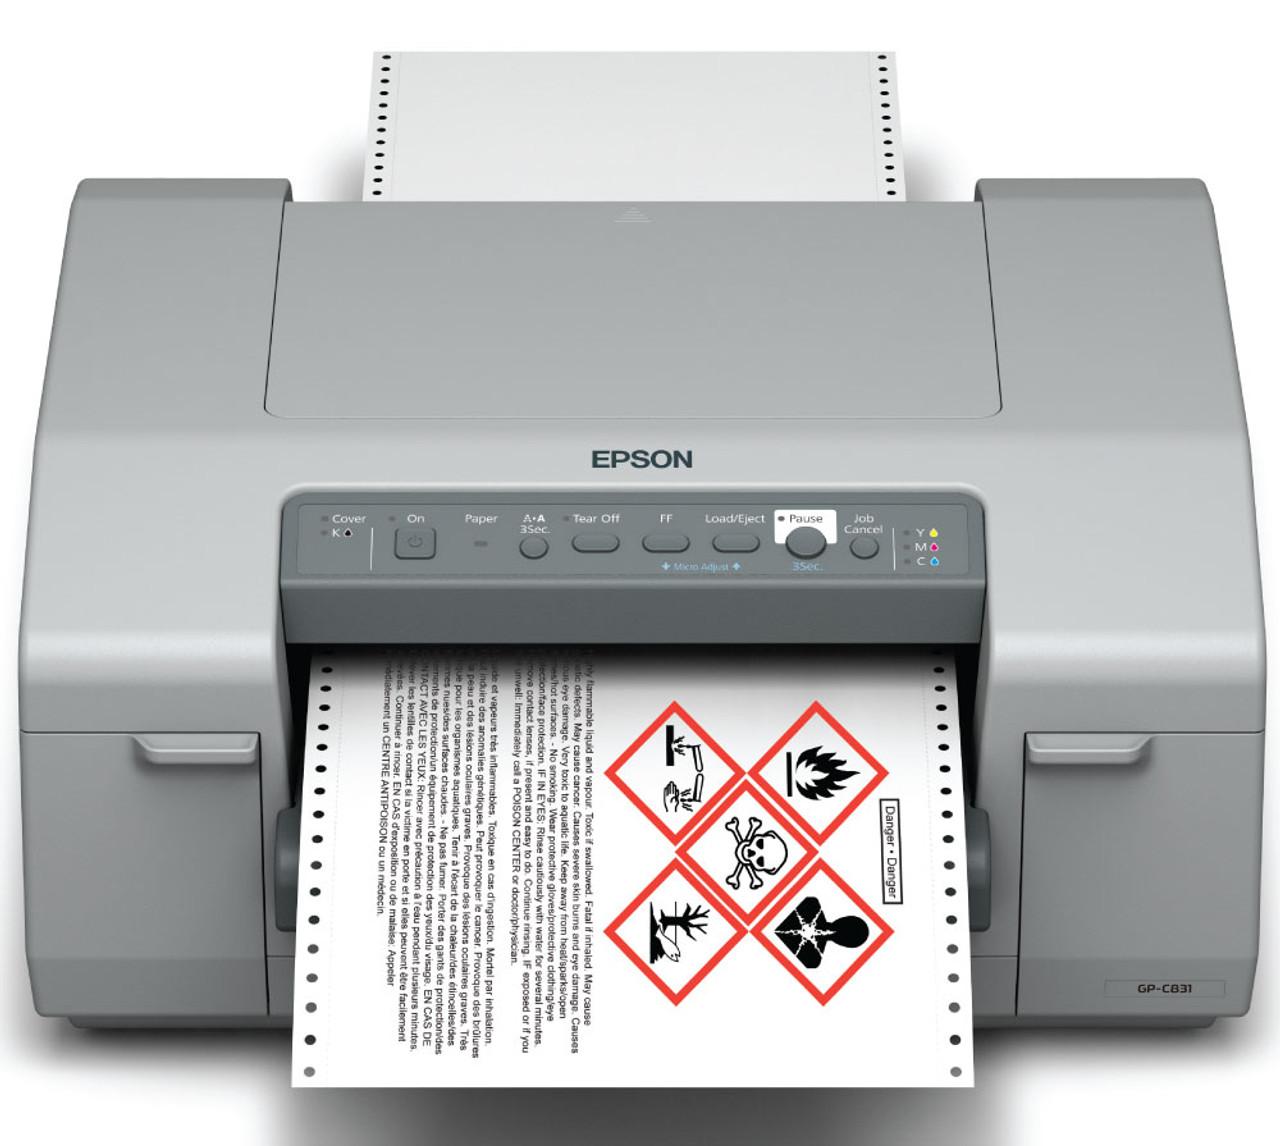 Epson GP-C831 Colour Label Printer